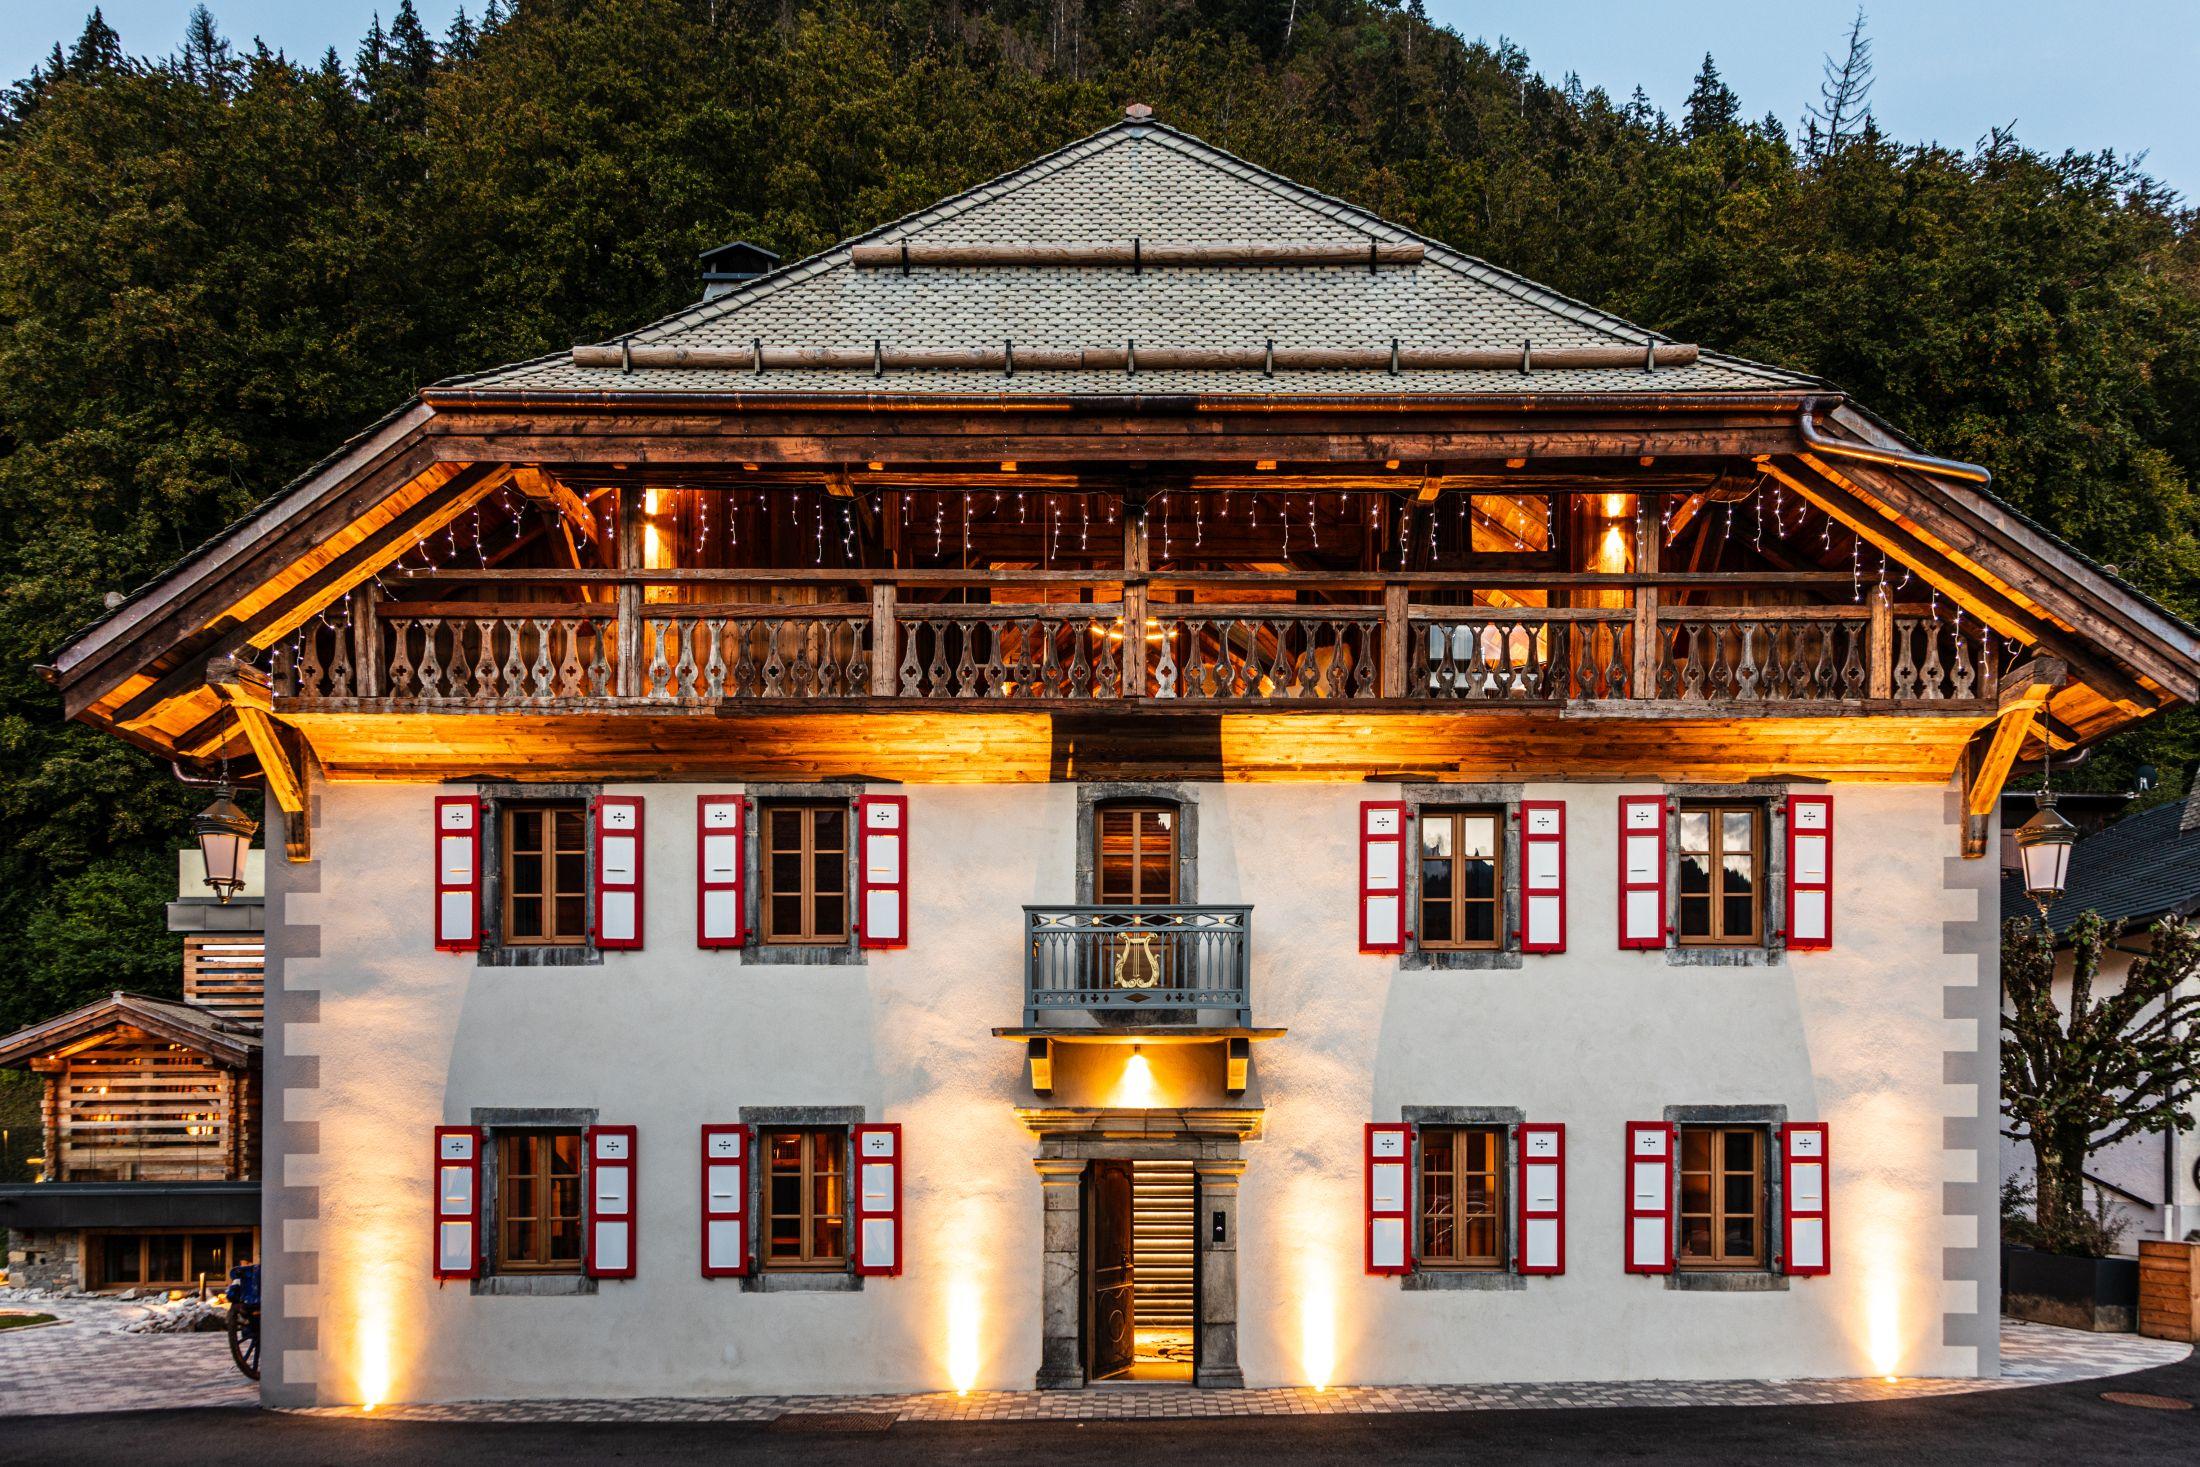 luxury summer chalet Morzine, luxury chalet holiday Morzine, ultimate luxury summer chalets, best summer chalets in the Alps